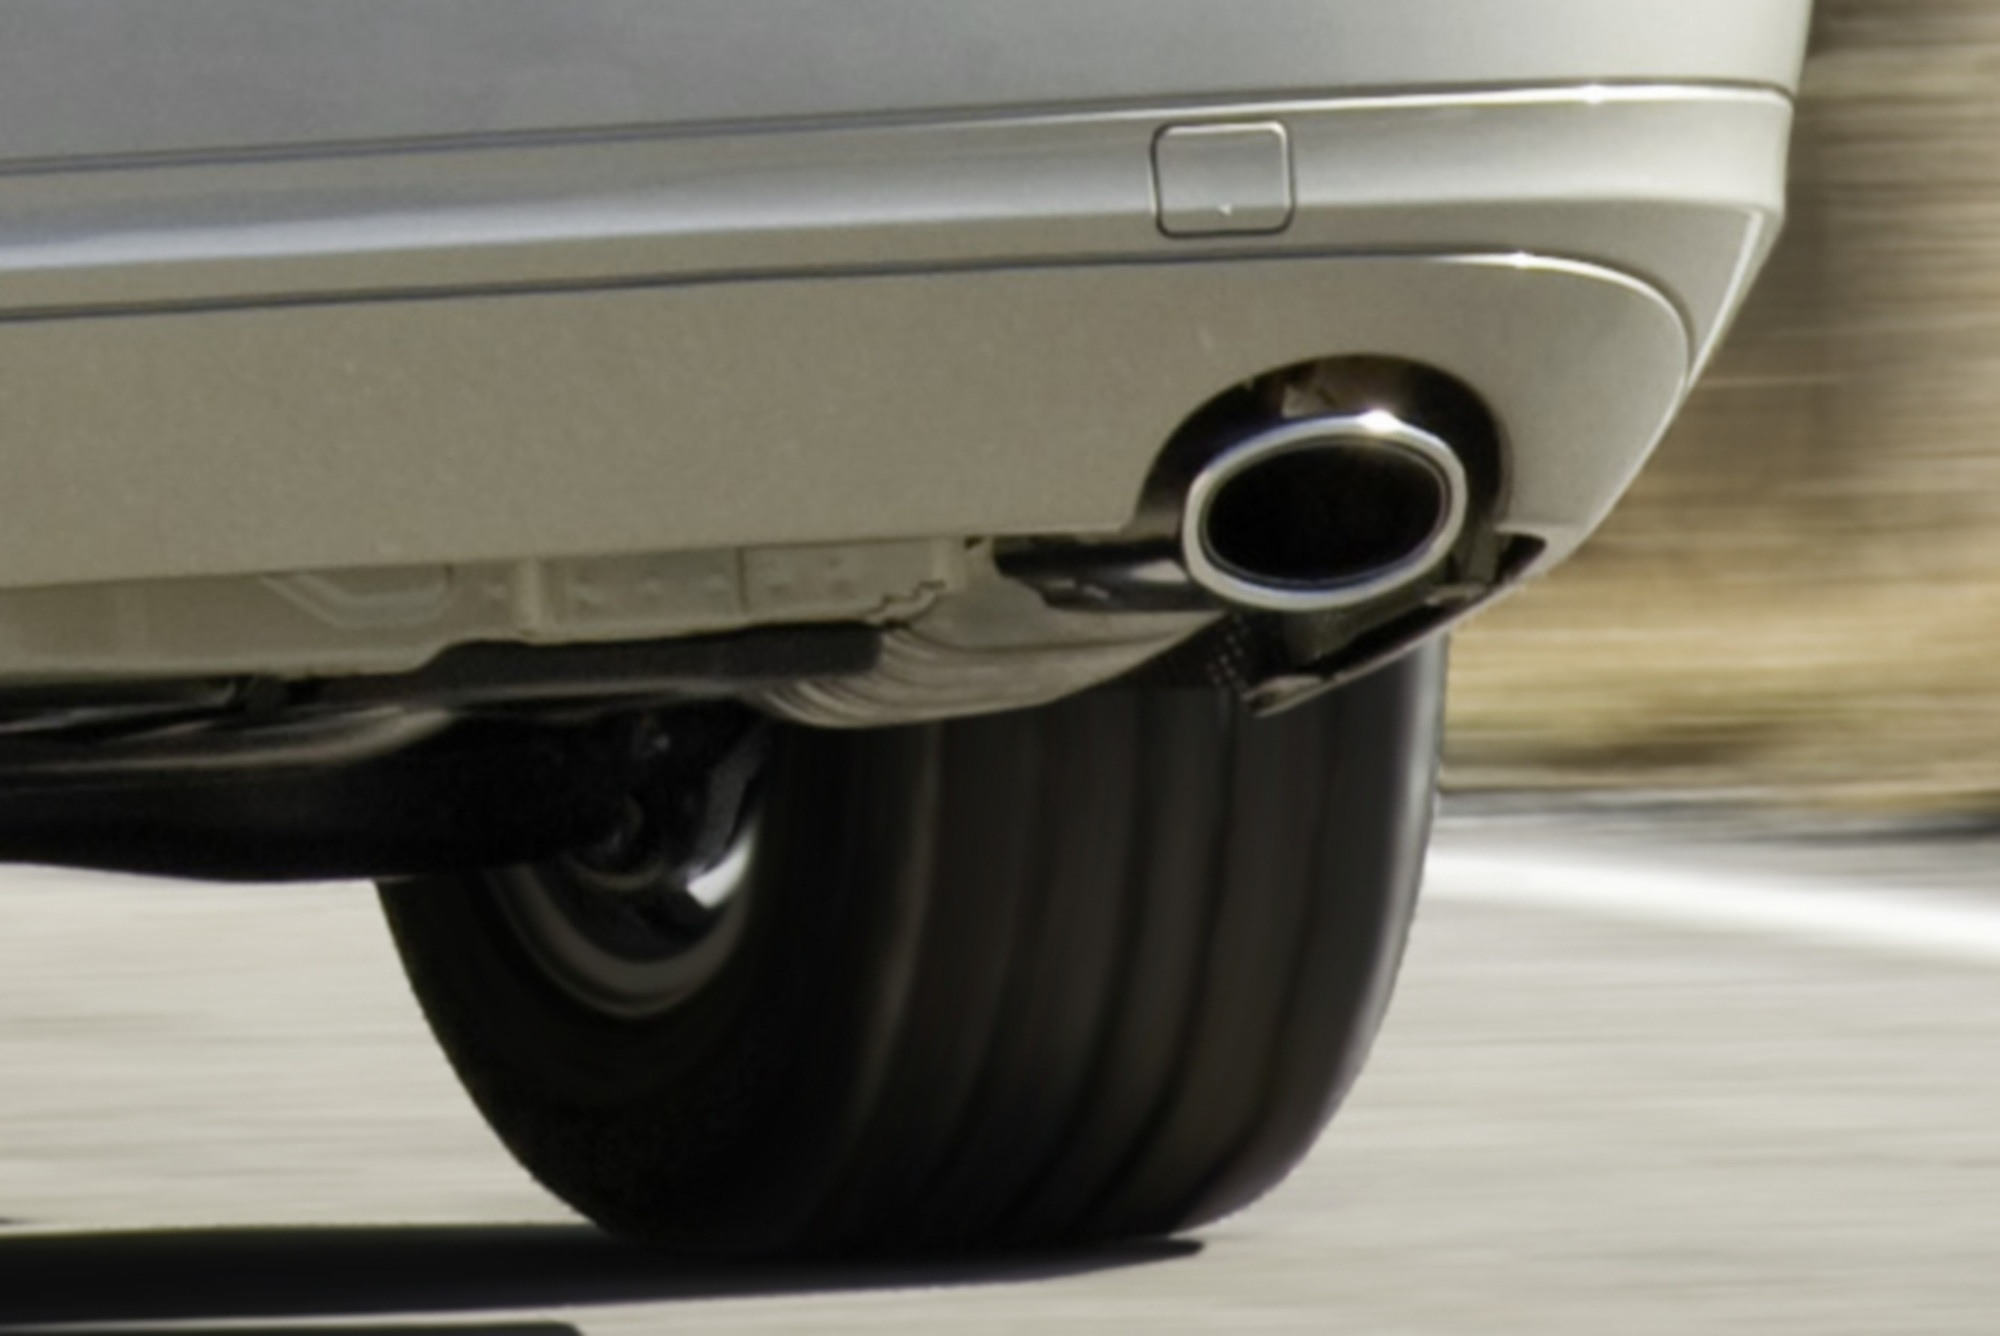 Statistik zur Abgasuntersuchung - 220.000 Fahrzeuge fielen durch